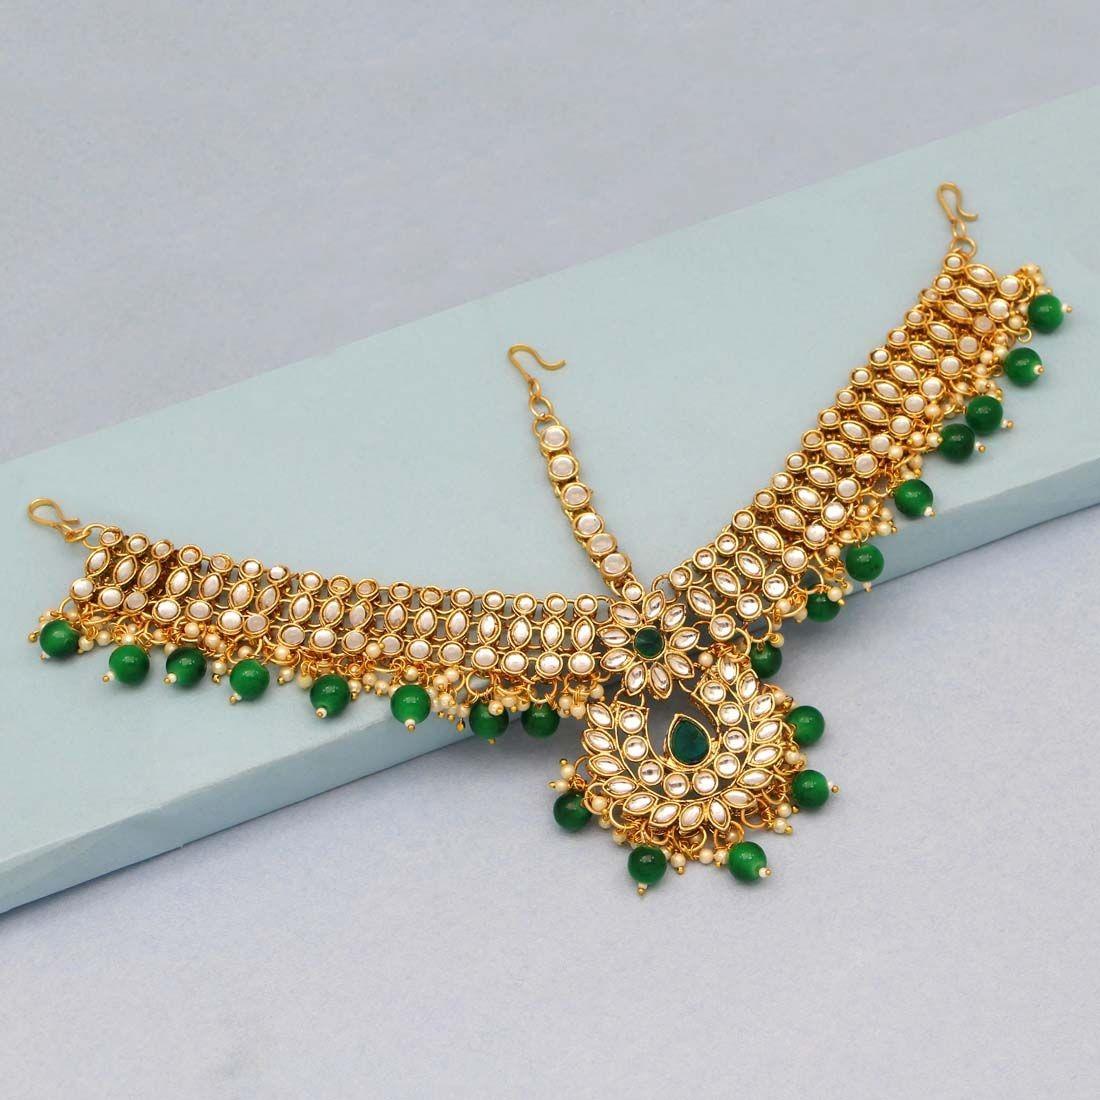 Tiara hindu verde esmeralda